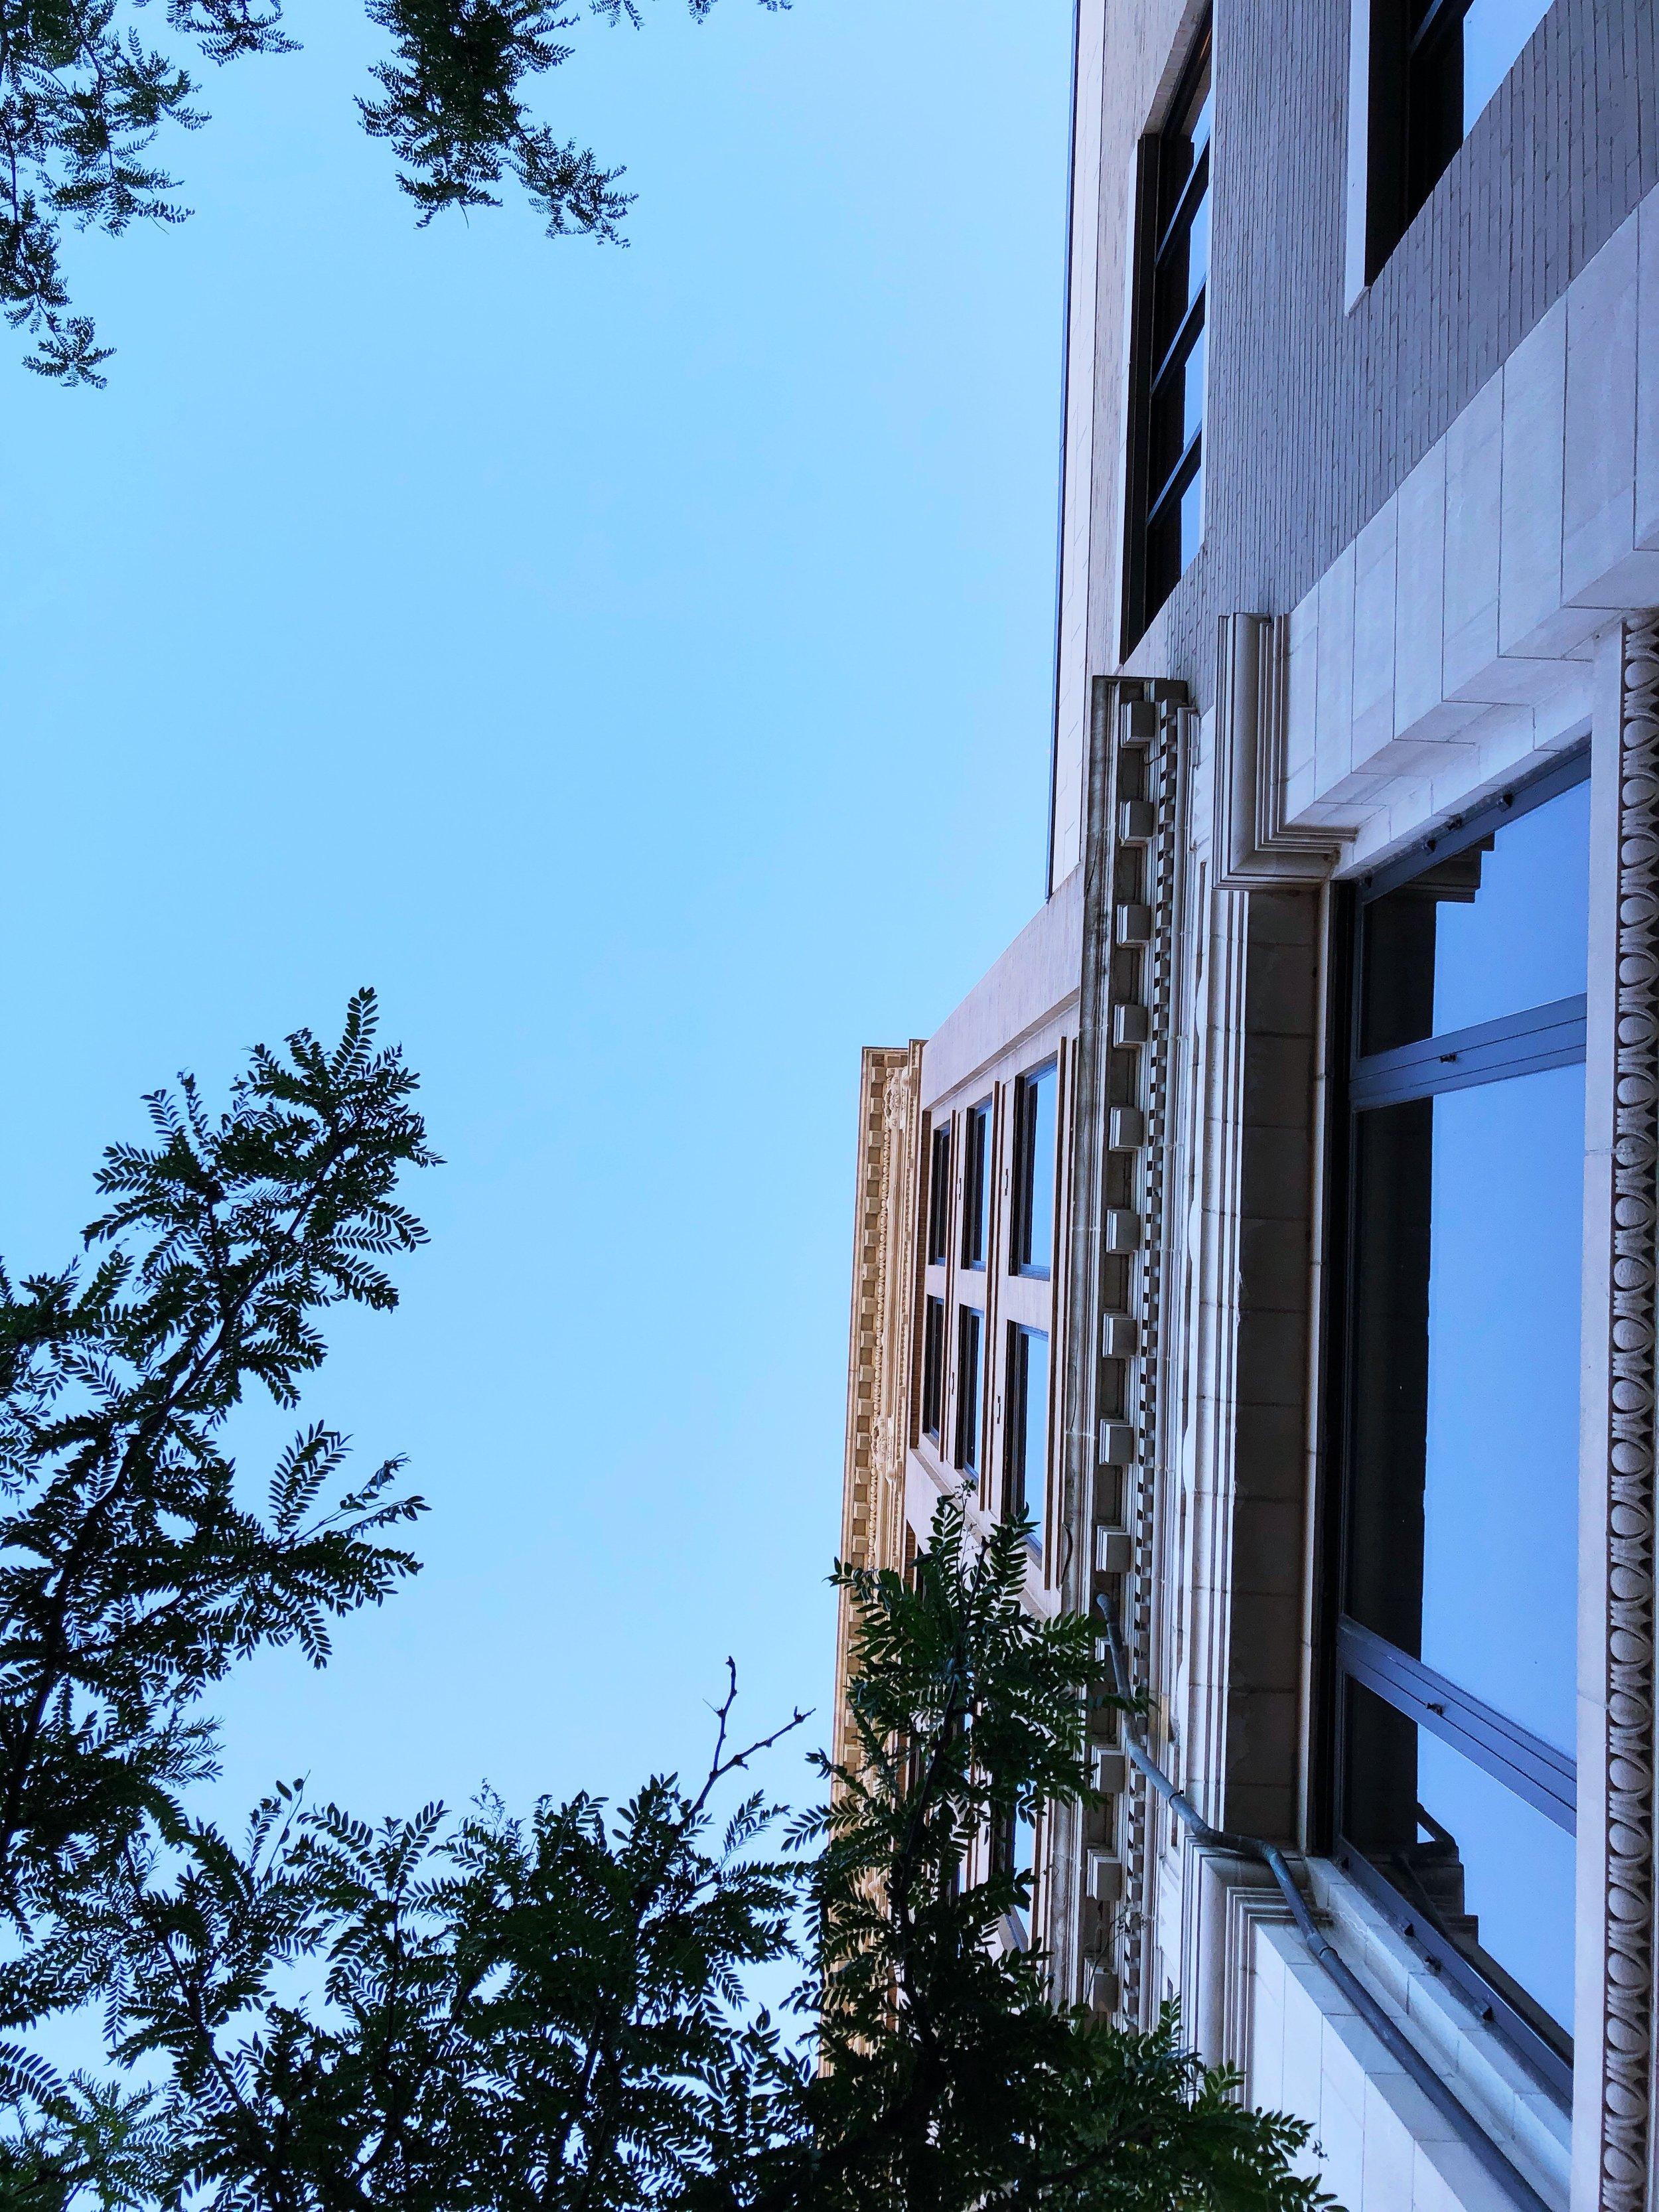 jefferson-city-mo-architecture-jeff-city-blog